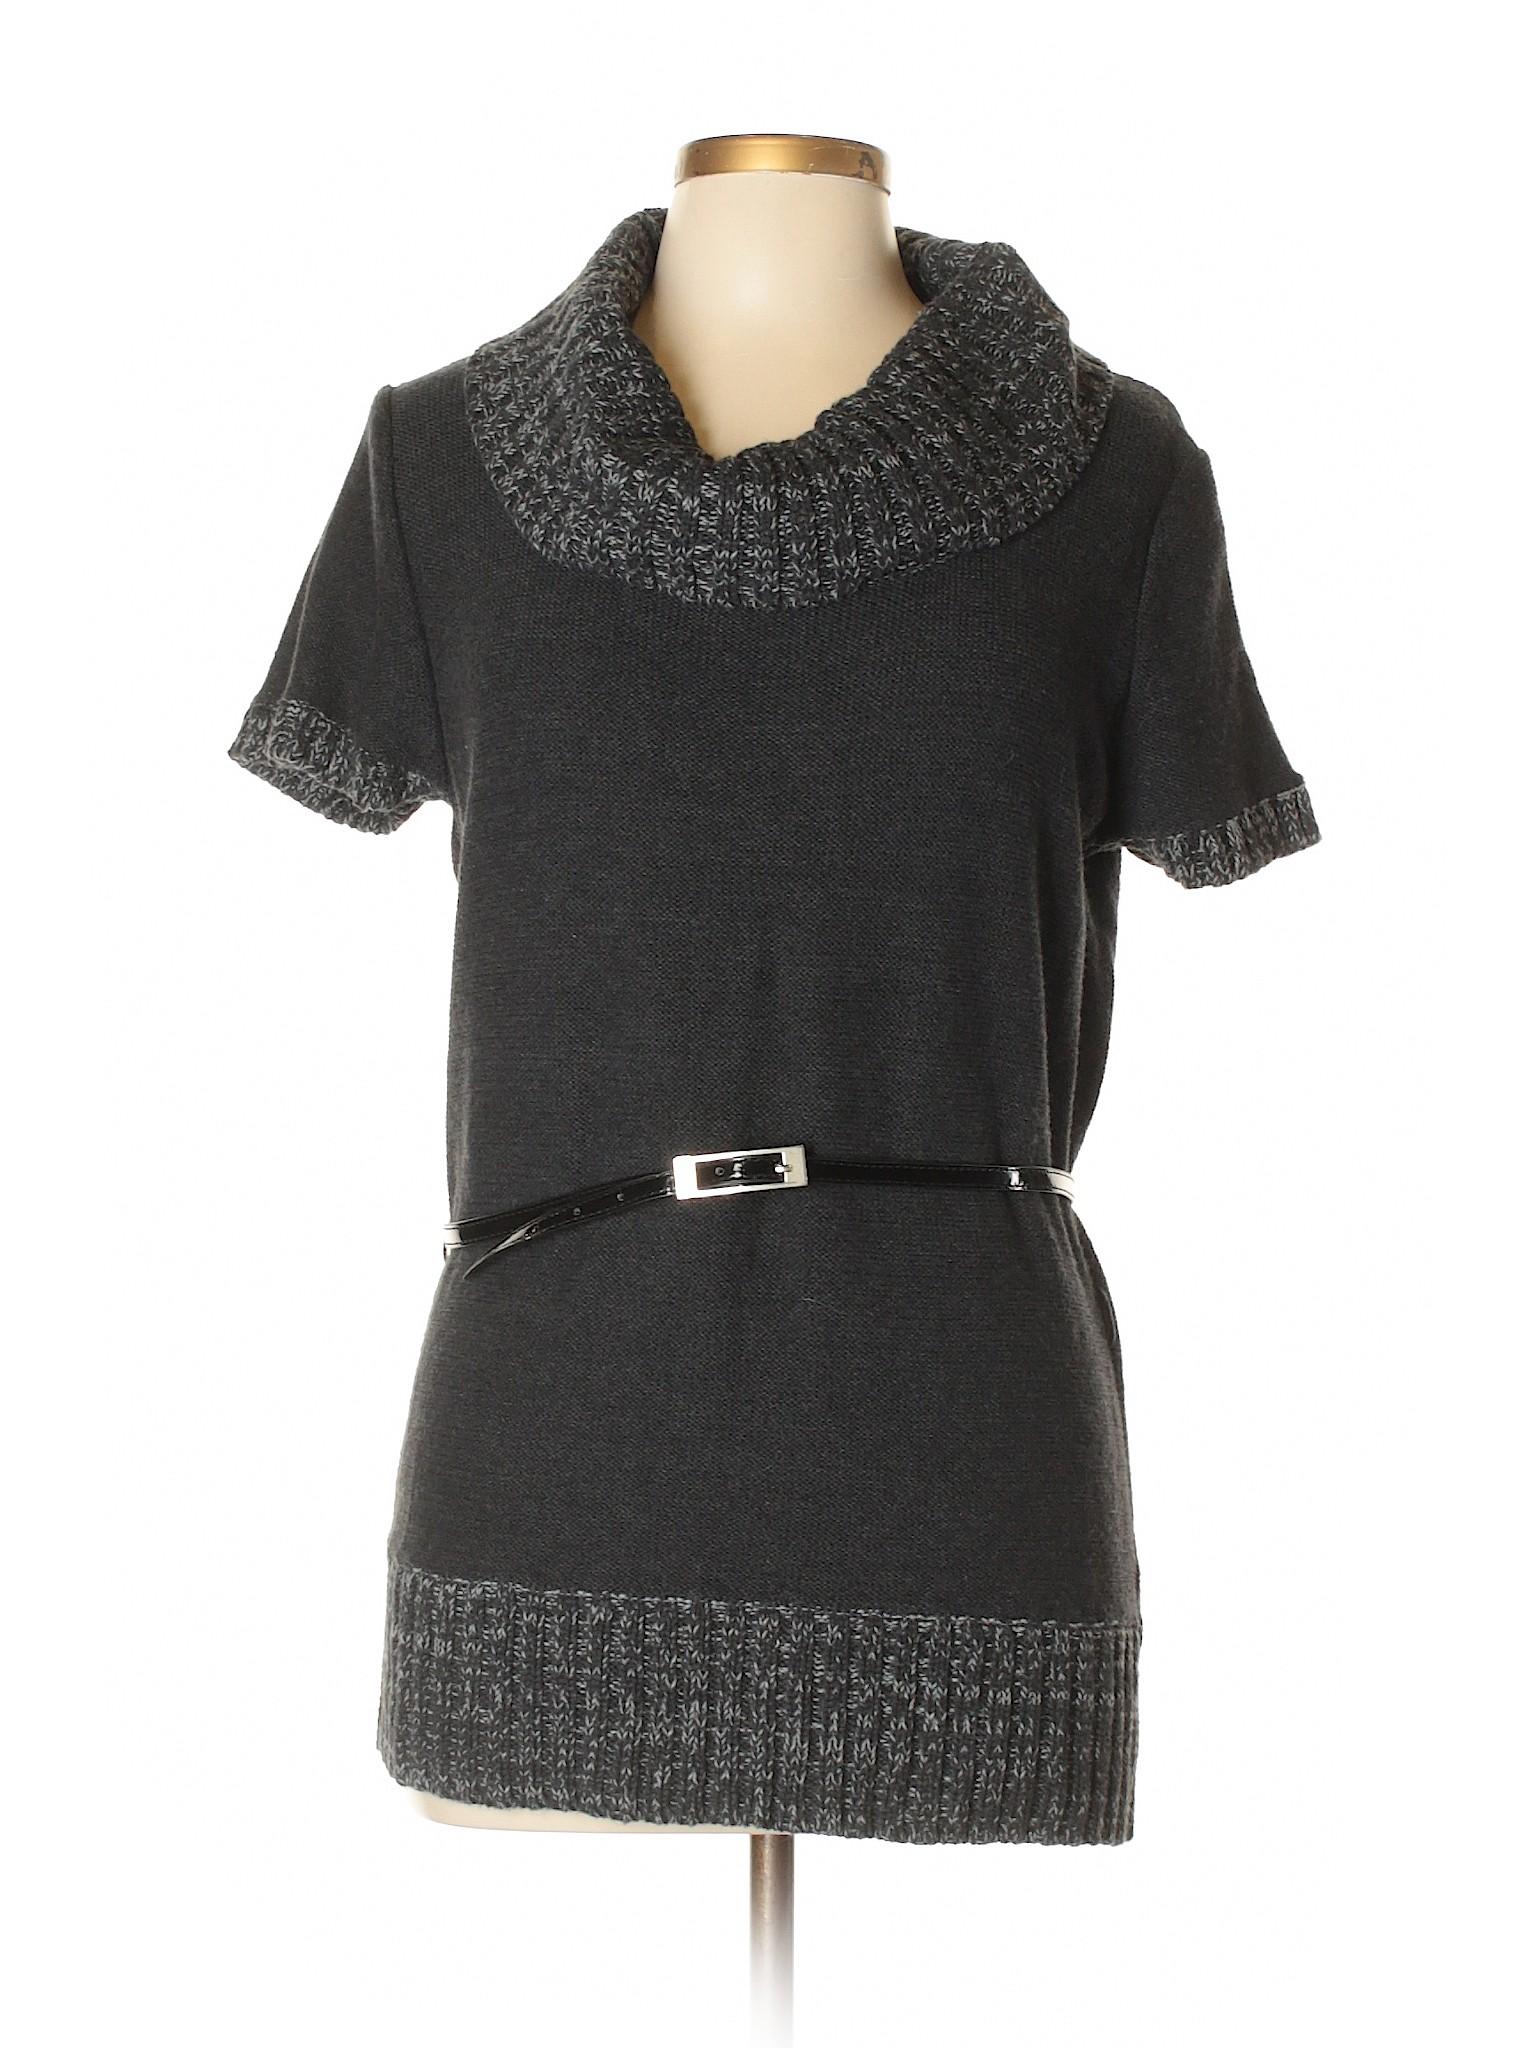 Boutique Boutique Alyx Pullover Sweater Pullover Alyx Sweater tt0qFwv